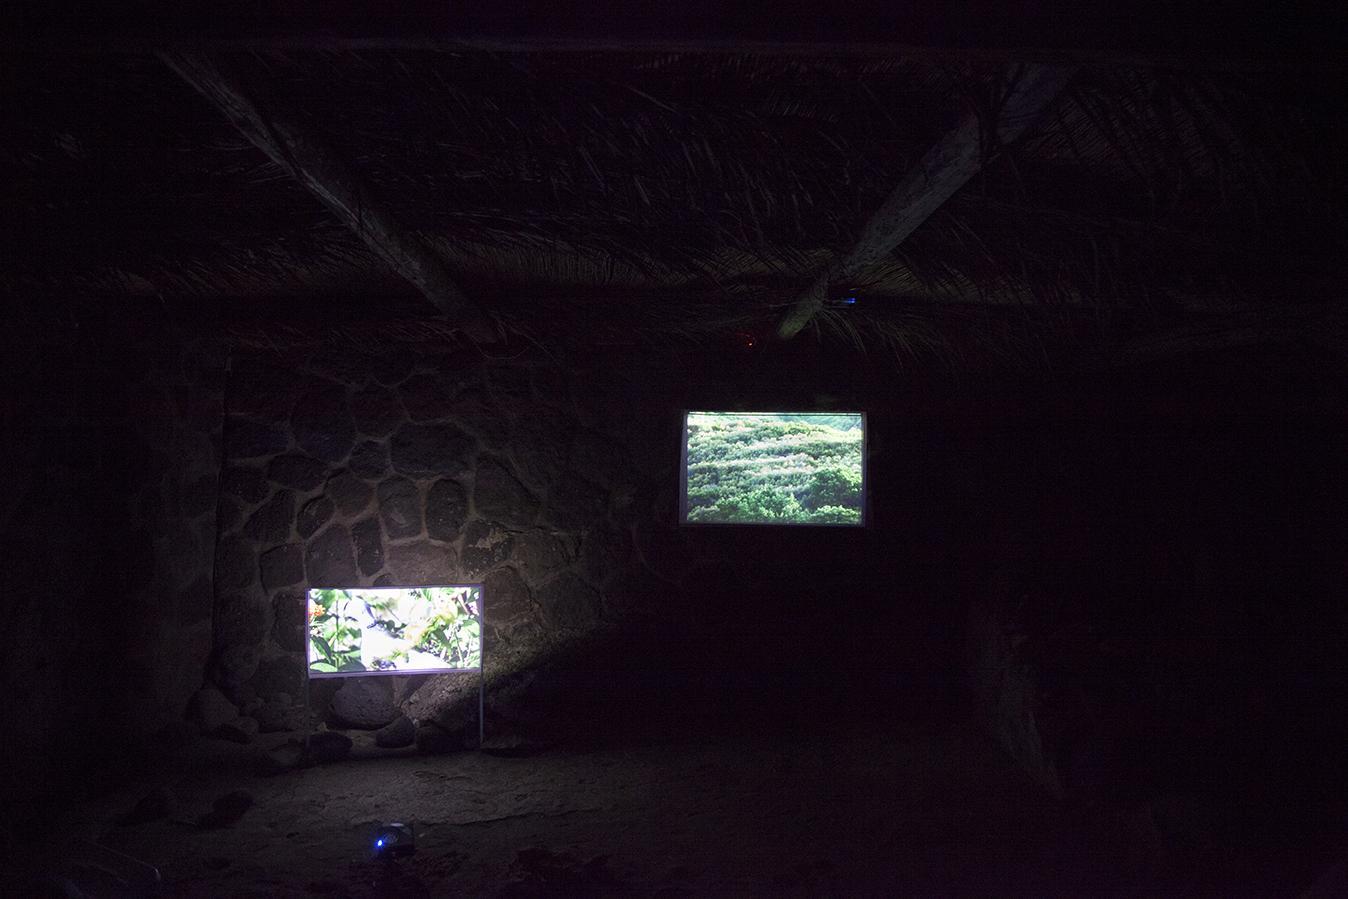 Martin Murphy /Arrivo di Aimée/, 2016 Two-channel video projection with sound, ft.Aimée Carmoz, 9:25 min Photo:Giovanna Silva Courtesy Fiorucci Art Trust, London